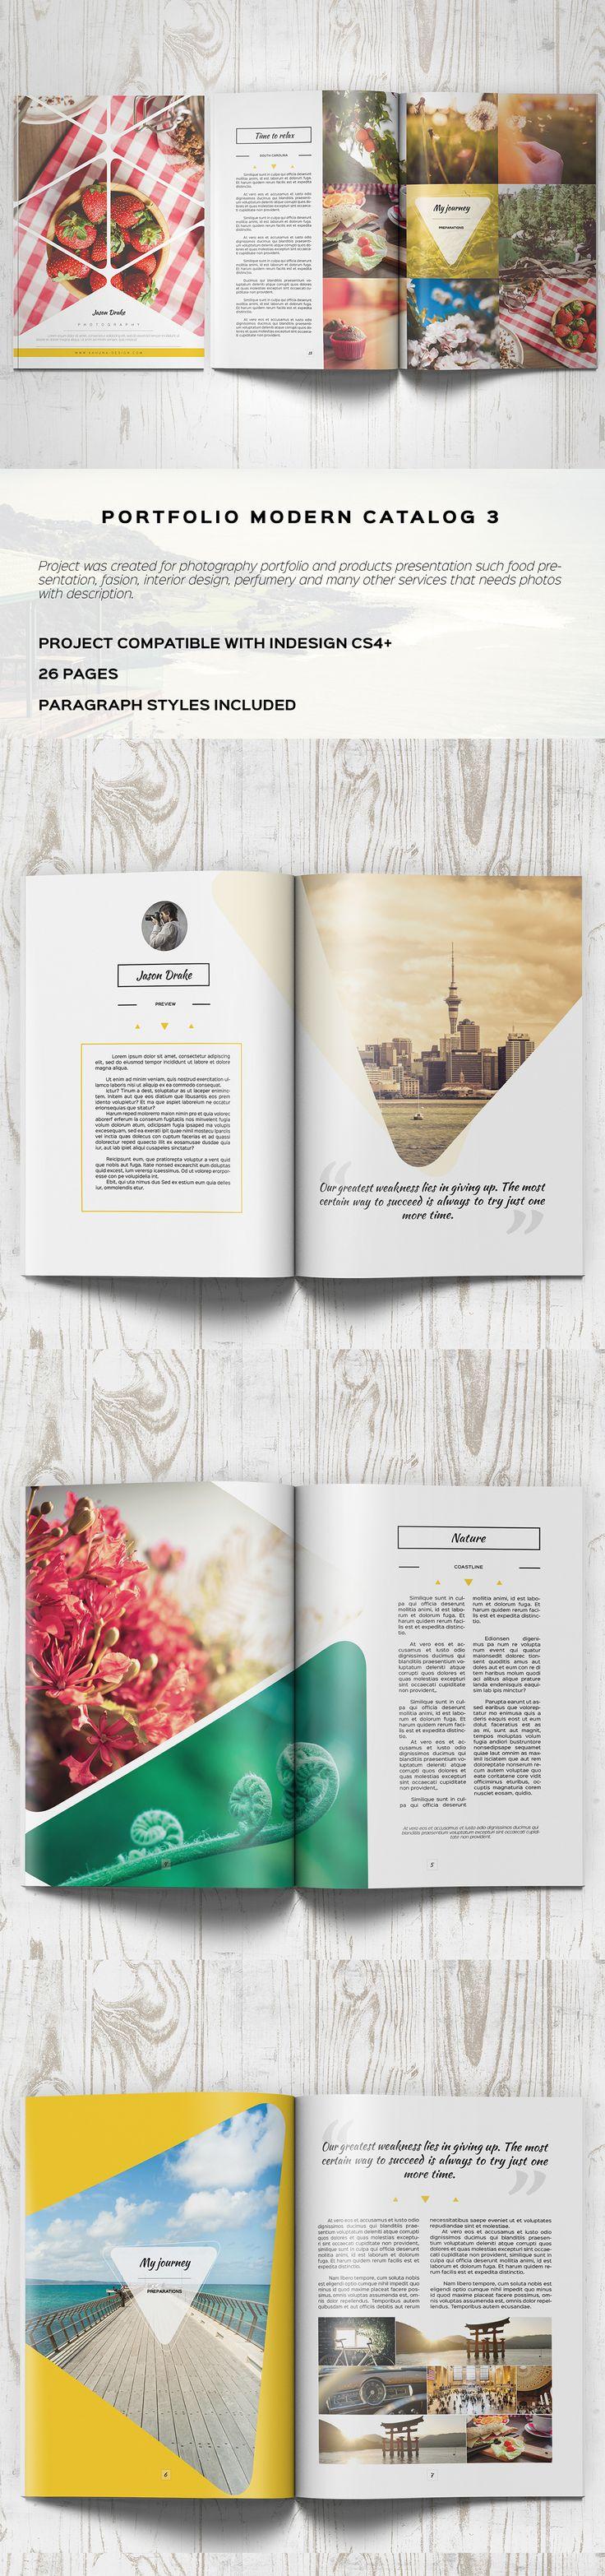 Portfolio Modern Brochure / Catalog 3 on Behance